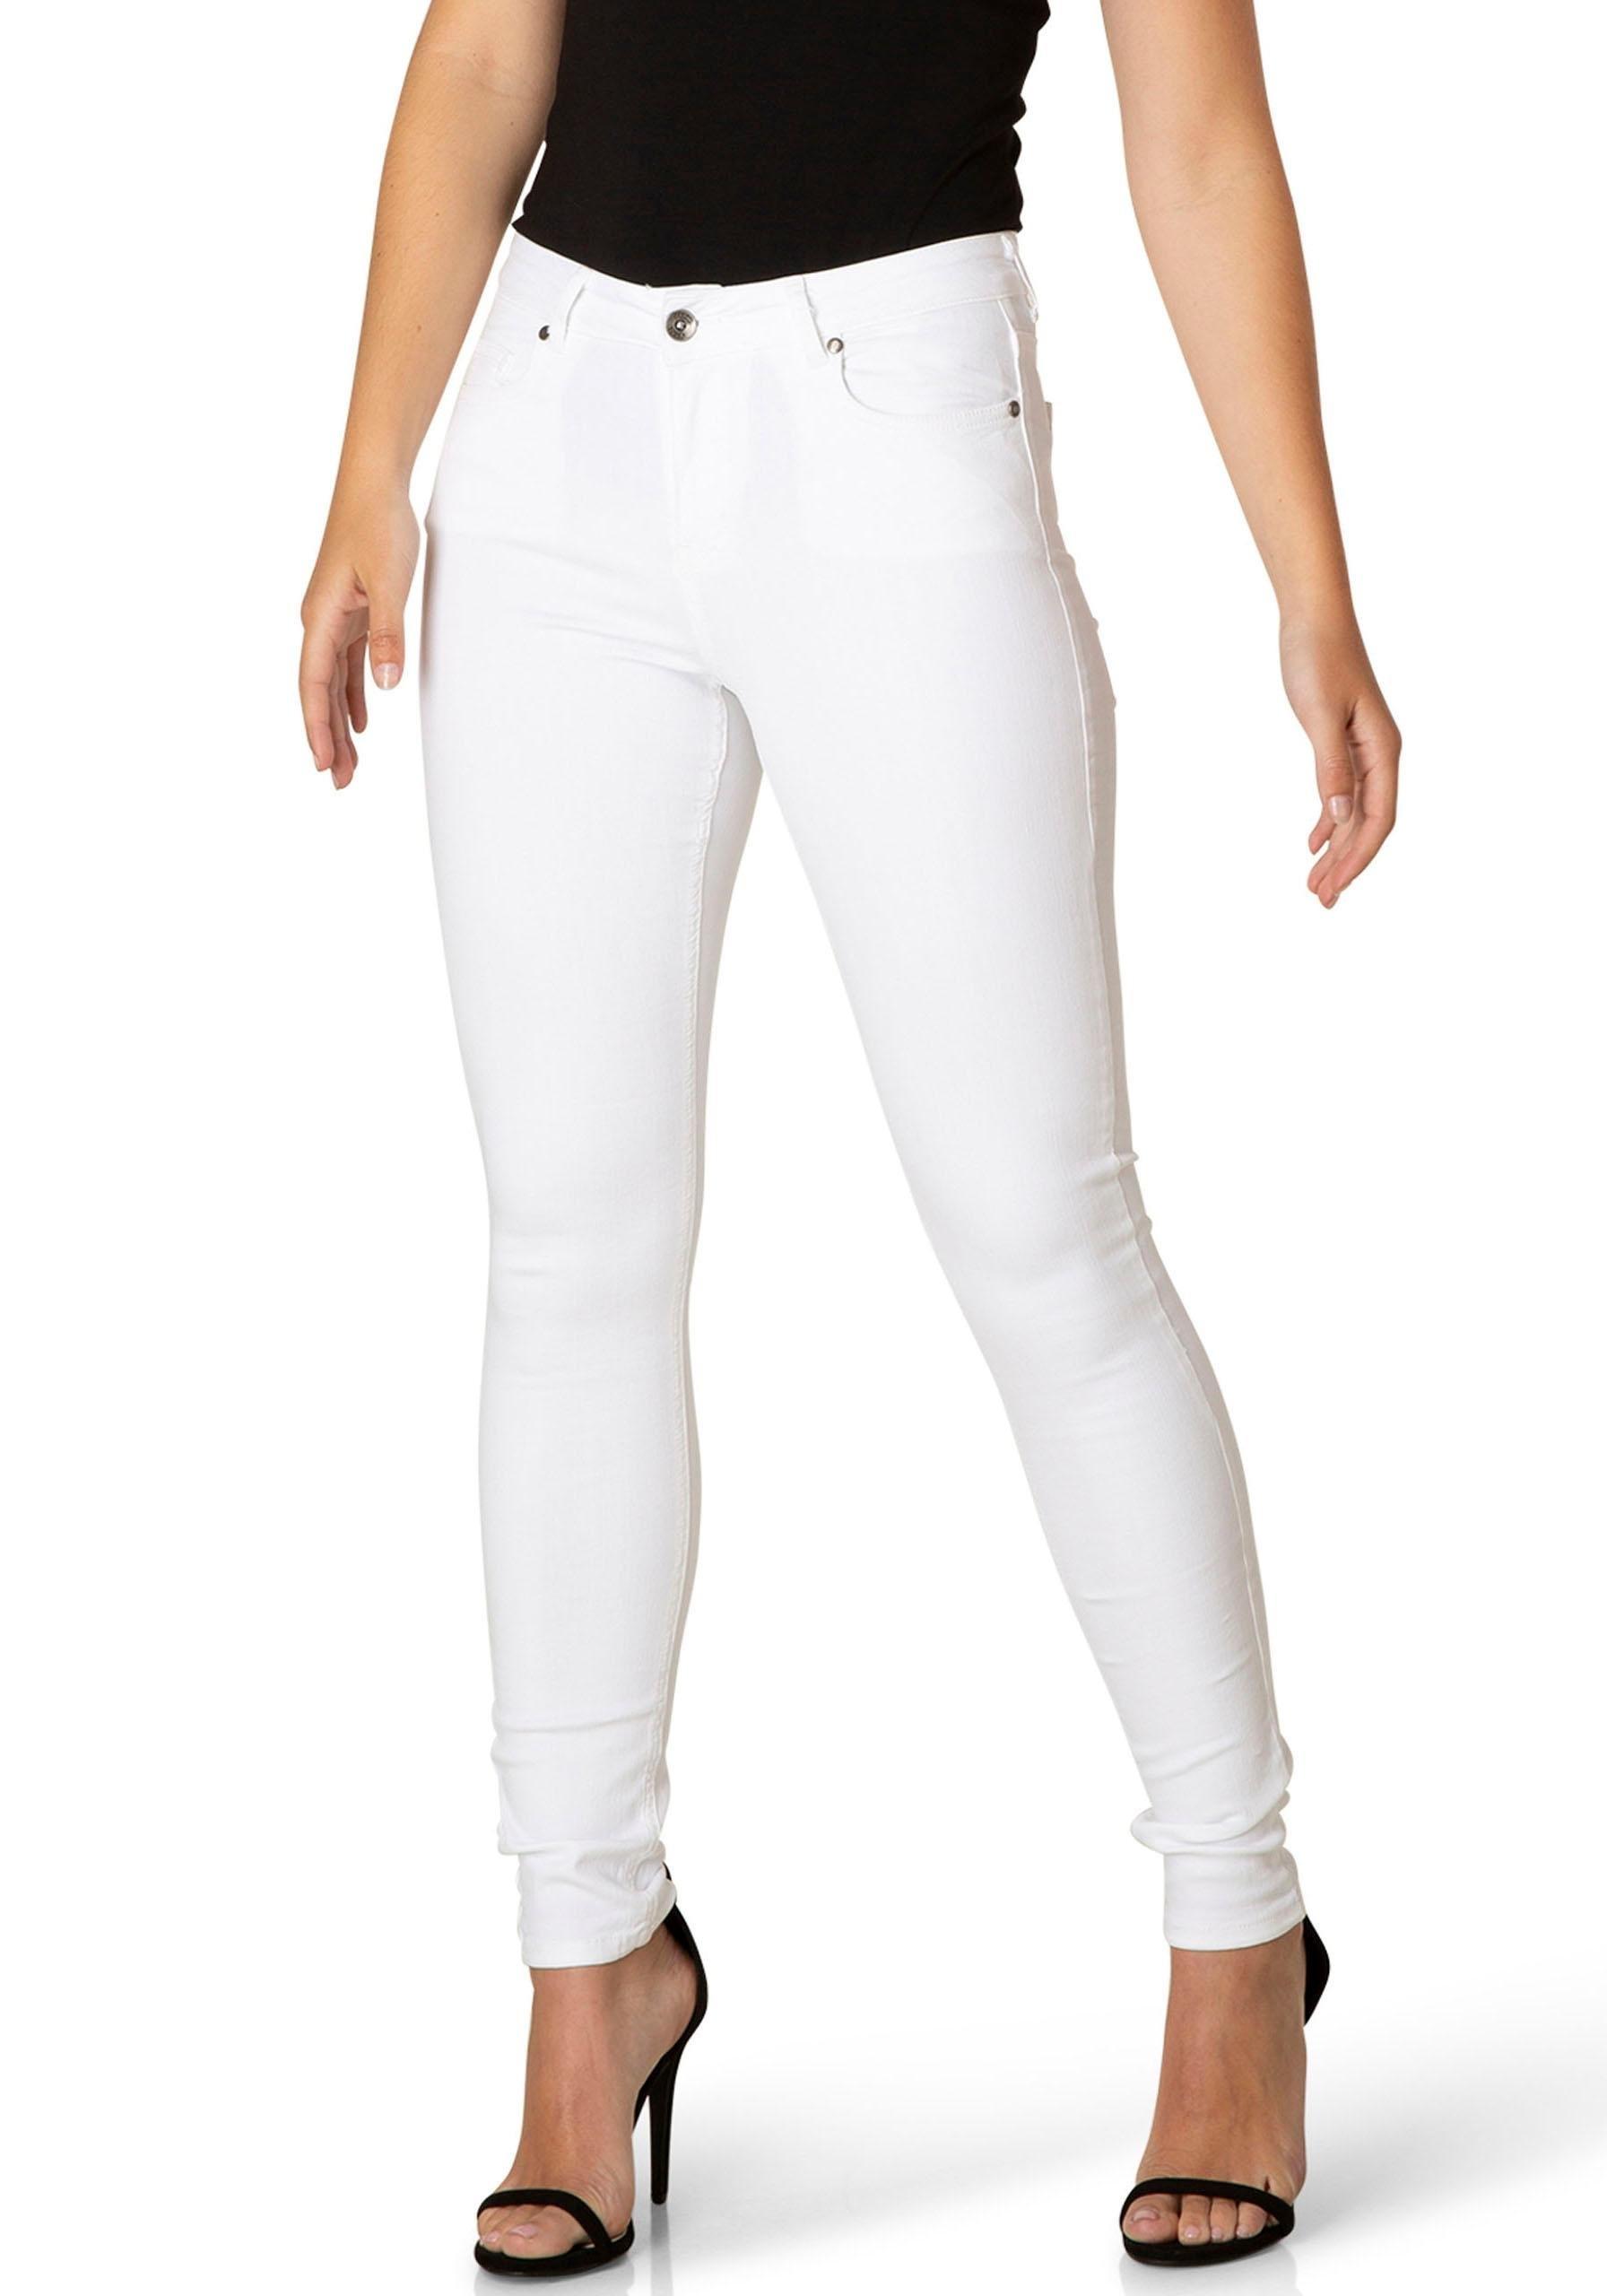 DNIM by Yest slim fit jeans »Mell« nu online kopen bij OTTO